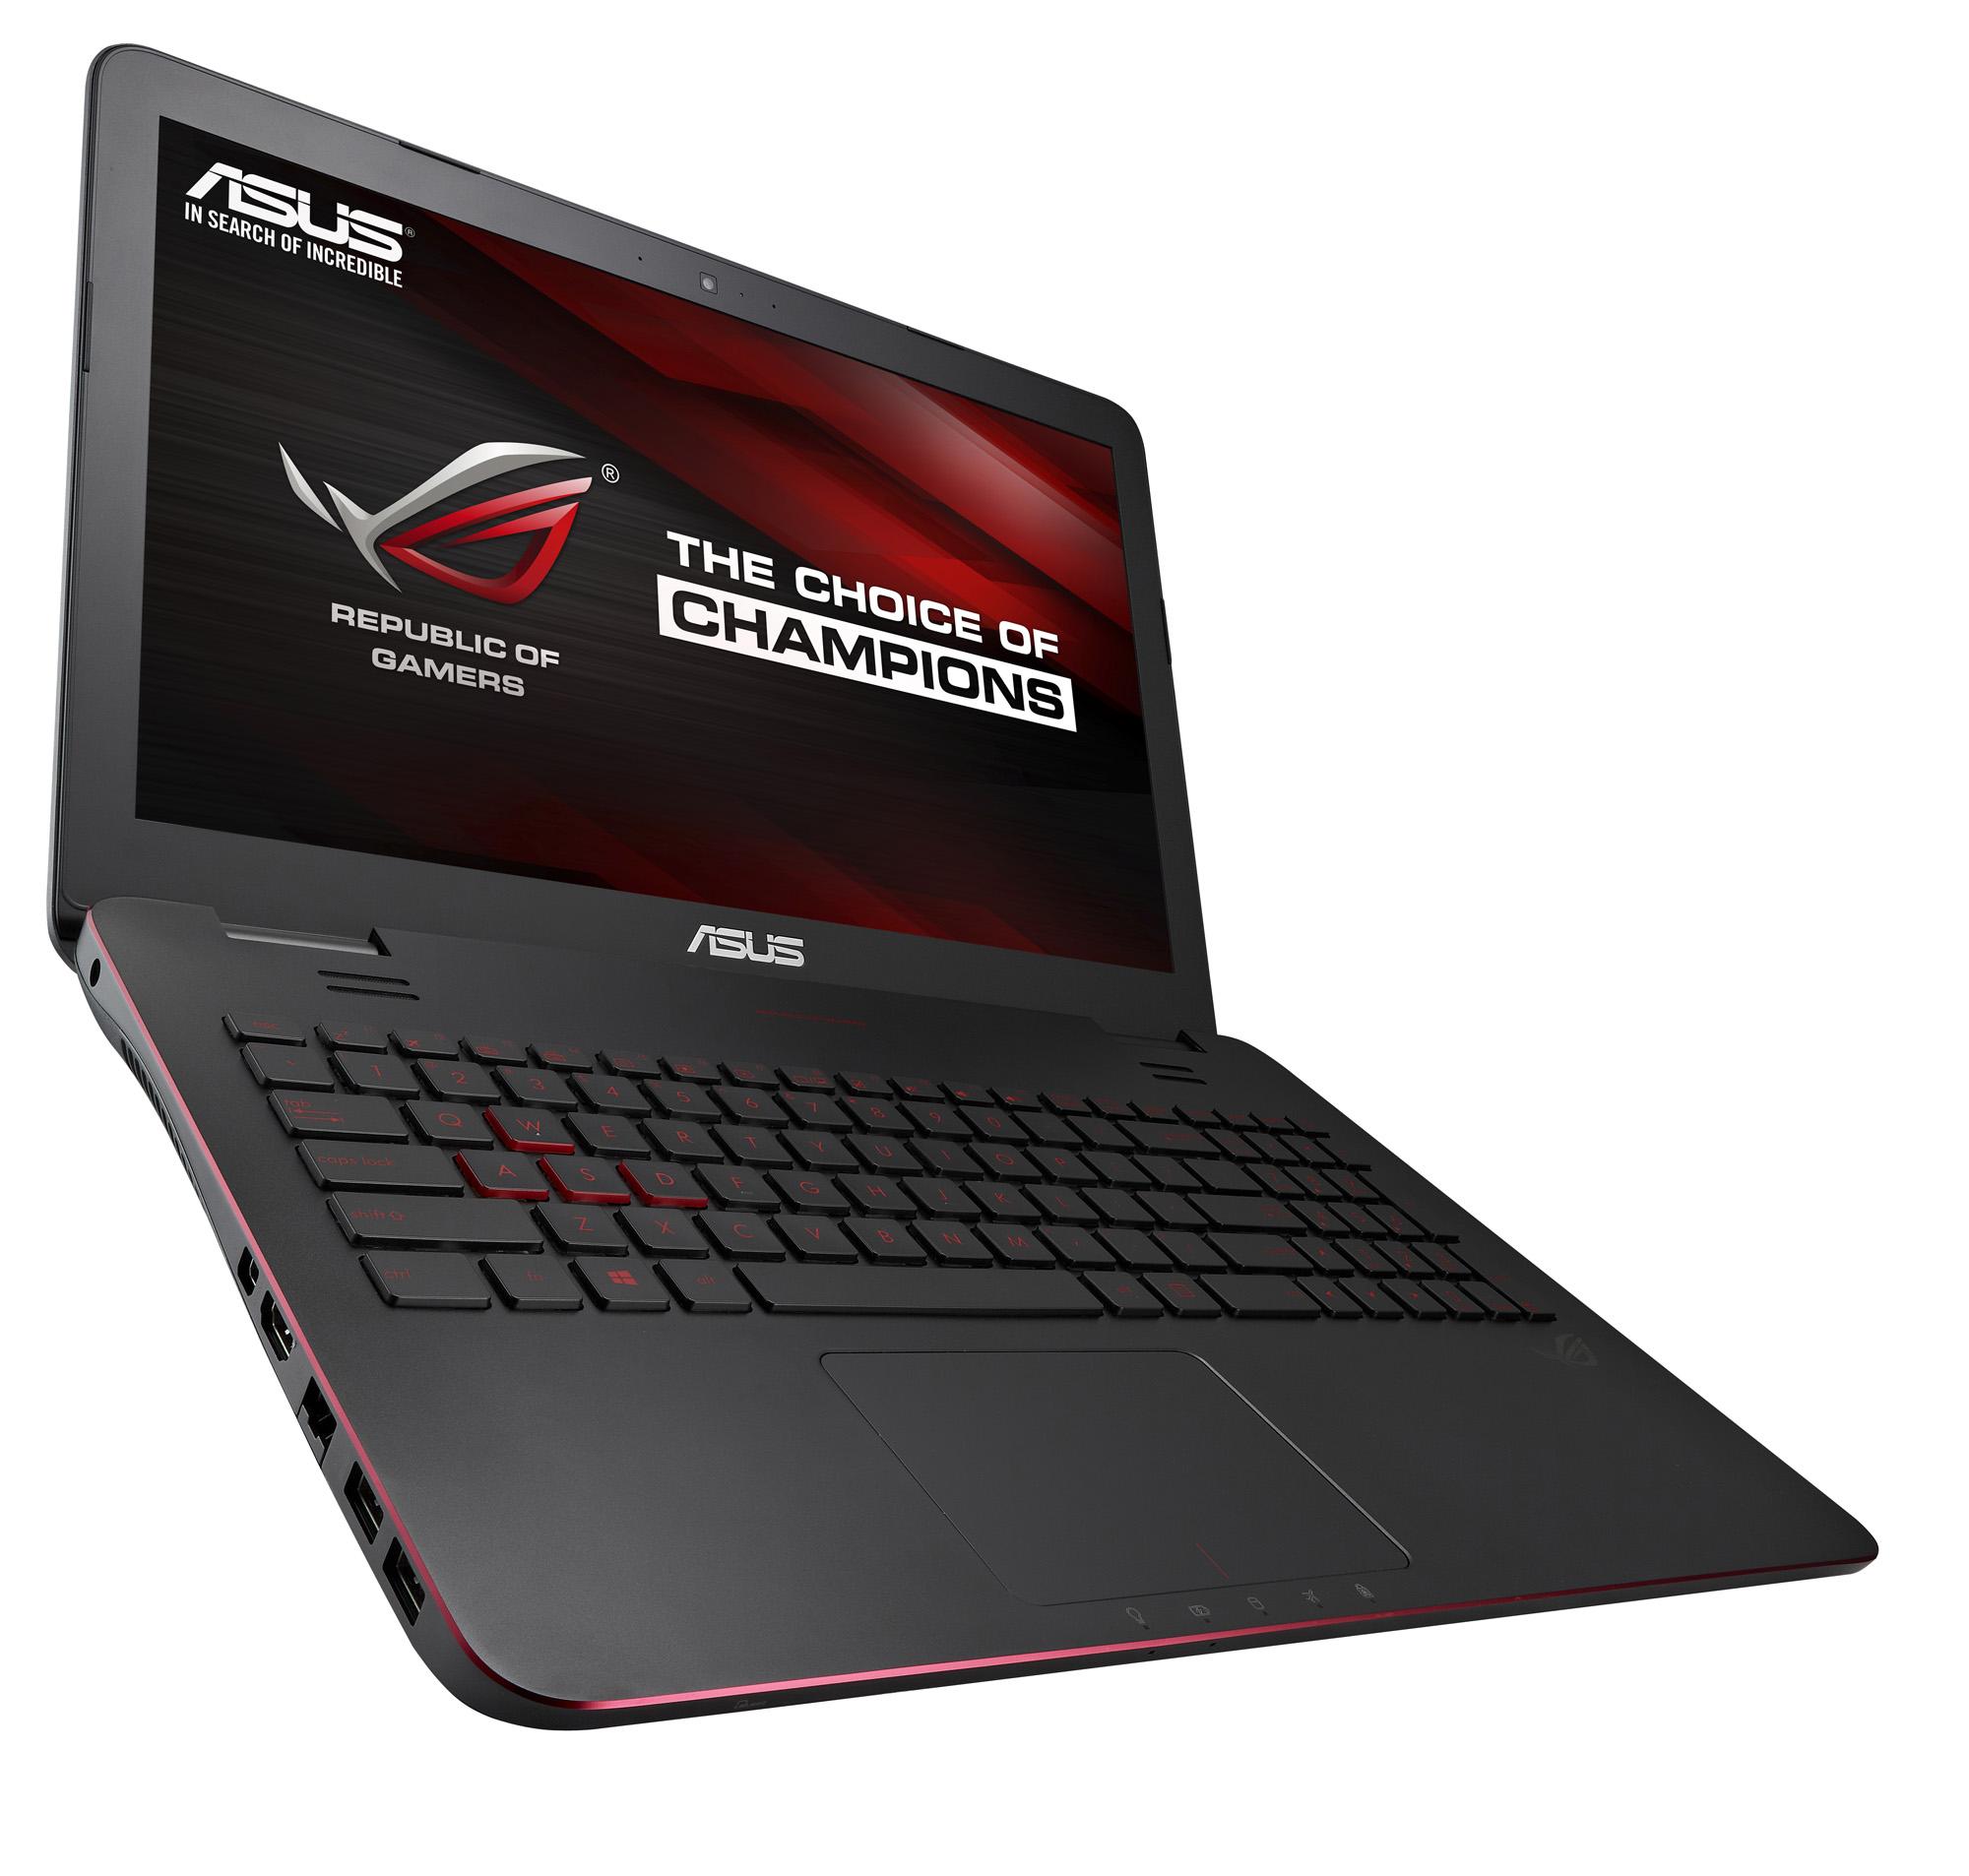 ASUS ROG G551JM-DM169H Gaming Notebook